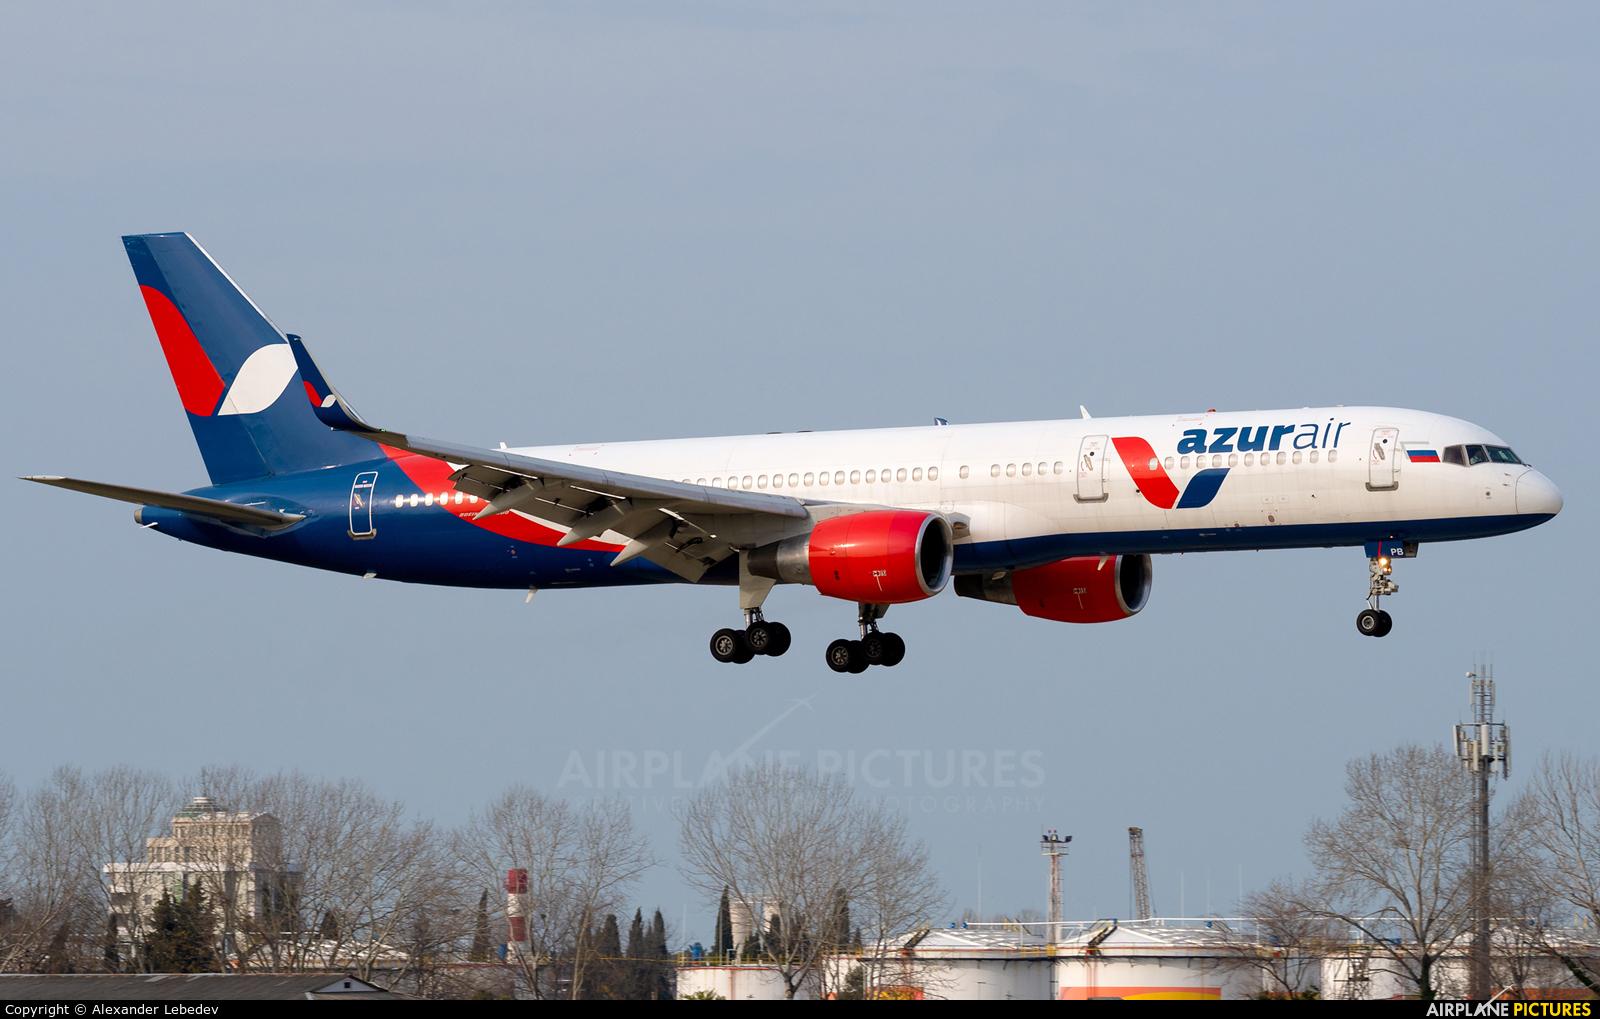 AzurAir VP-BPB aircraft at Sochi Intl